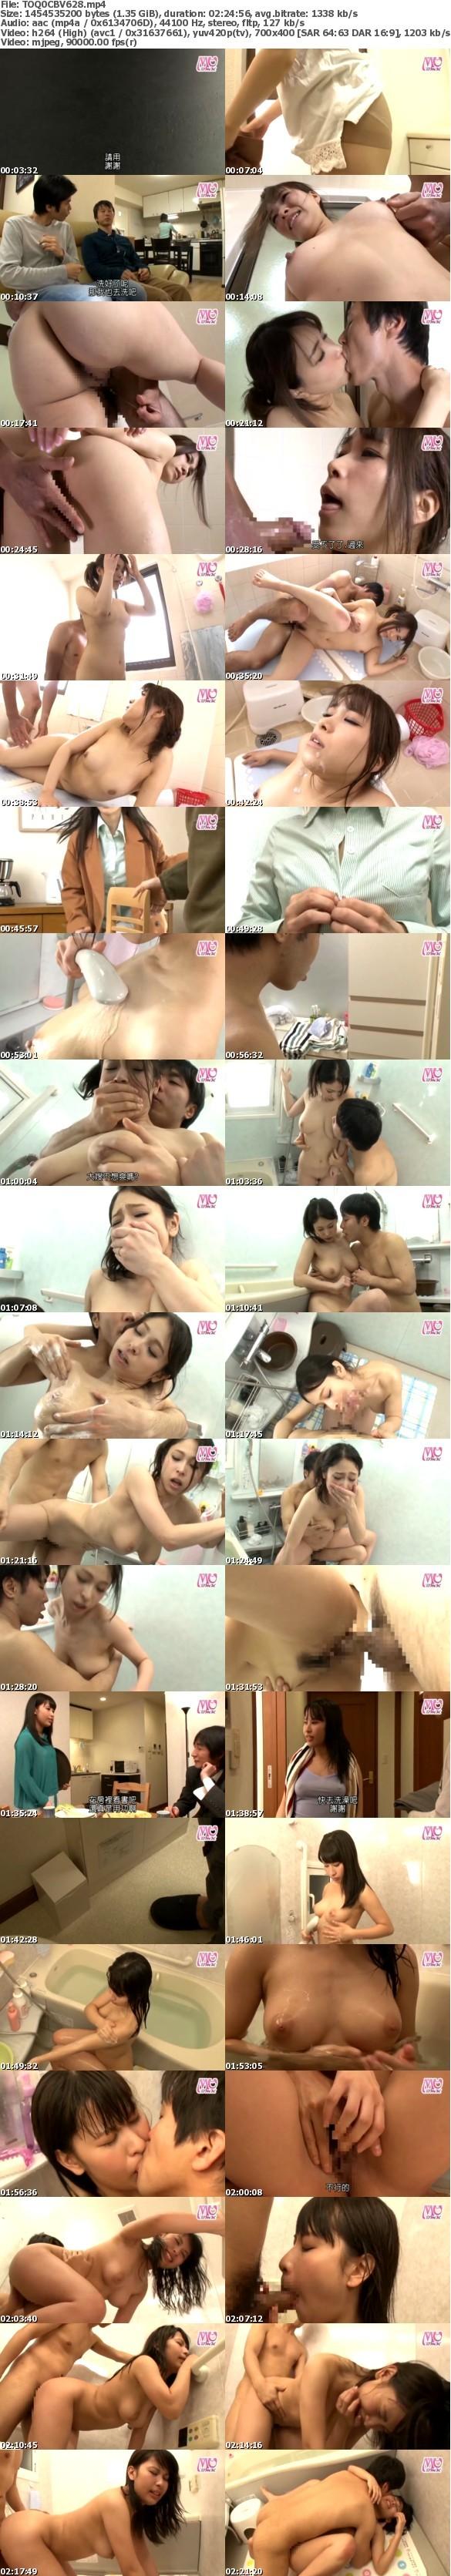 [FSET-628] 大嫂在洗澡時我意外闖入了[中文字幕]